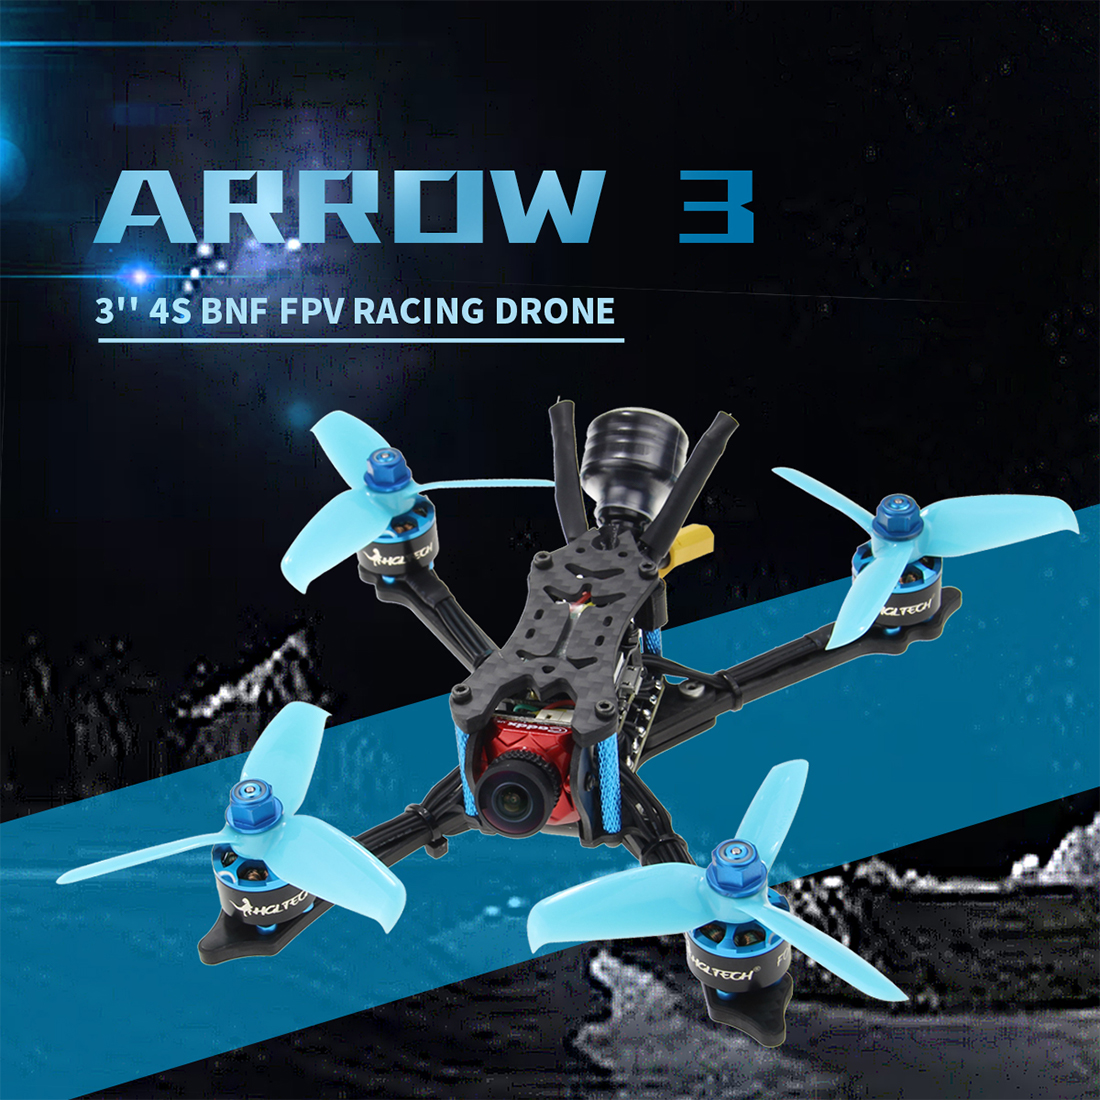 HGLRC Arrow3 152mm de 3 pulgadas F4 OSD 4S/6 S Mini FPV Racer Dron PNP BNF con 45A CES Caddx Ratel 1200TVL Cámara RC Quadcopter - 2